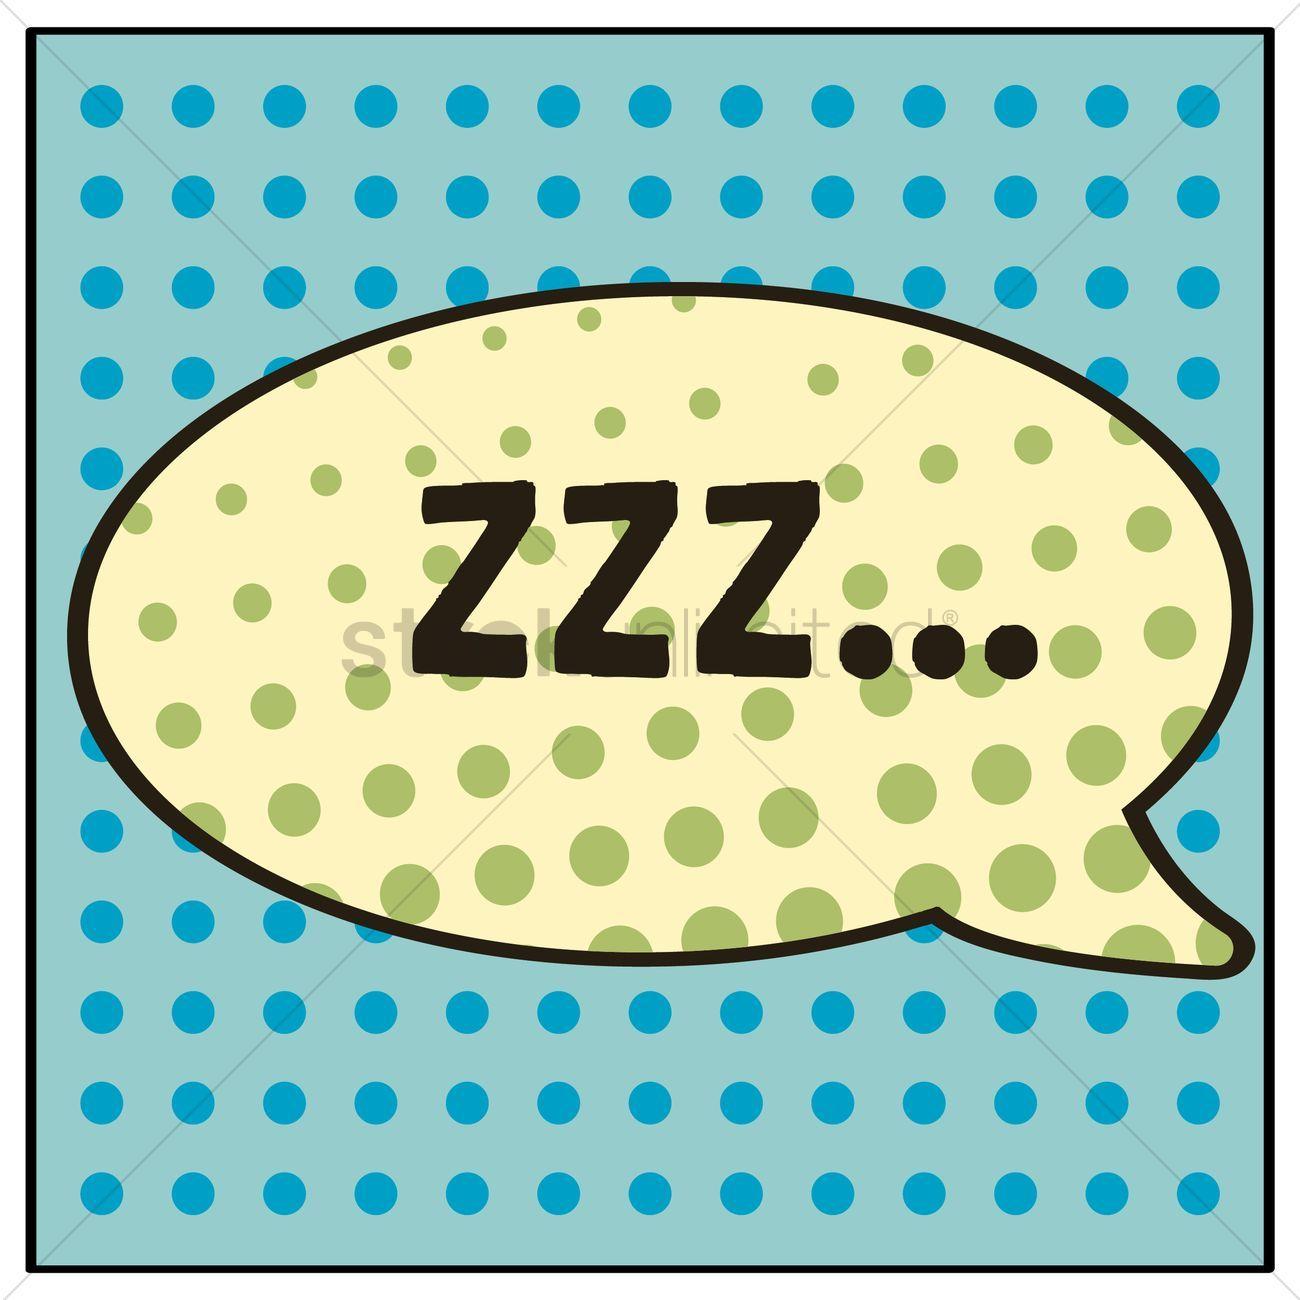 Zzz Comic Speech Bubble Vector Illustration Ad Speech Comic Zzz Illustration Vector Affiliate In 2020 Enamel Pins Sur.ly for joomla sur.ly plugin for joomla 2.5/3.0 is free of charge. zzz comic speech bubble vector